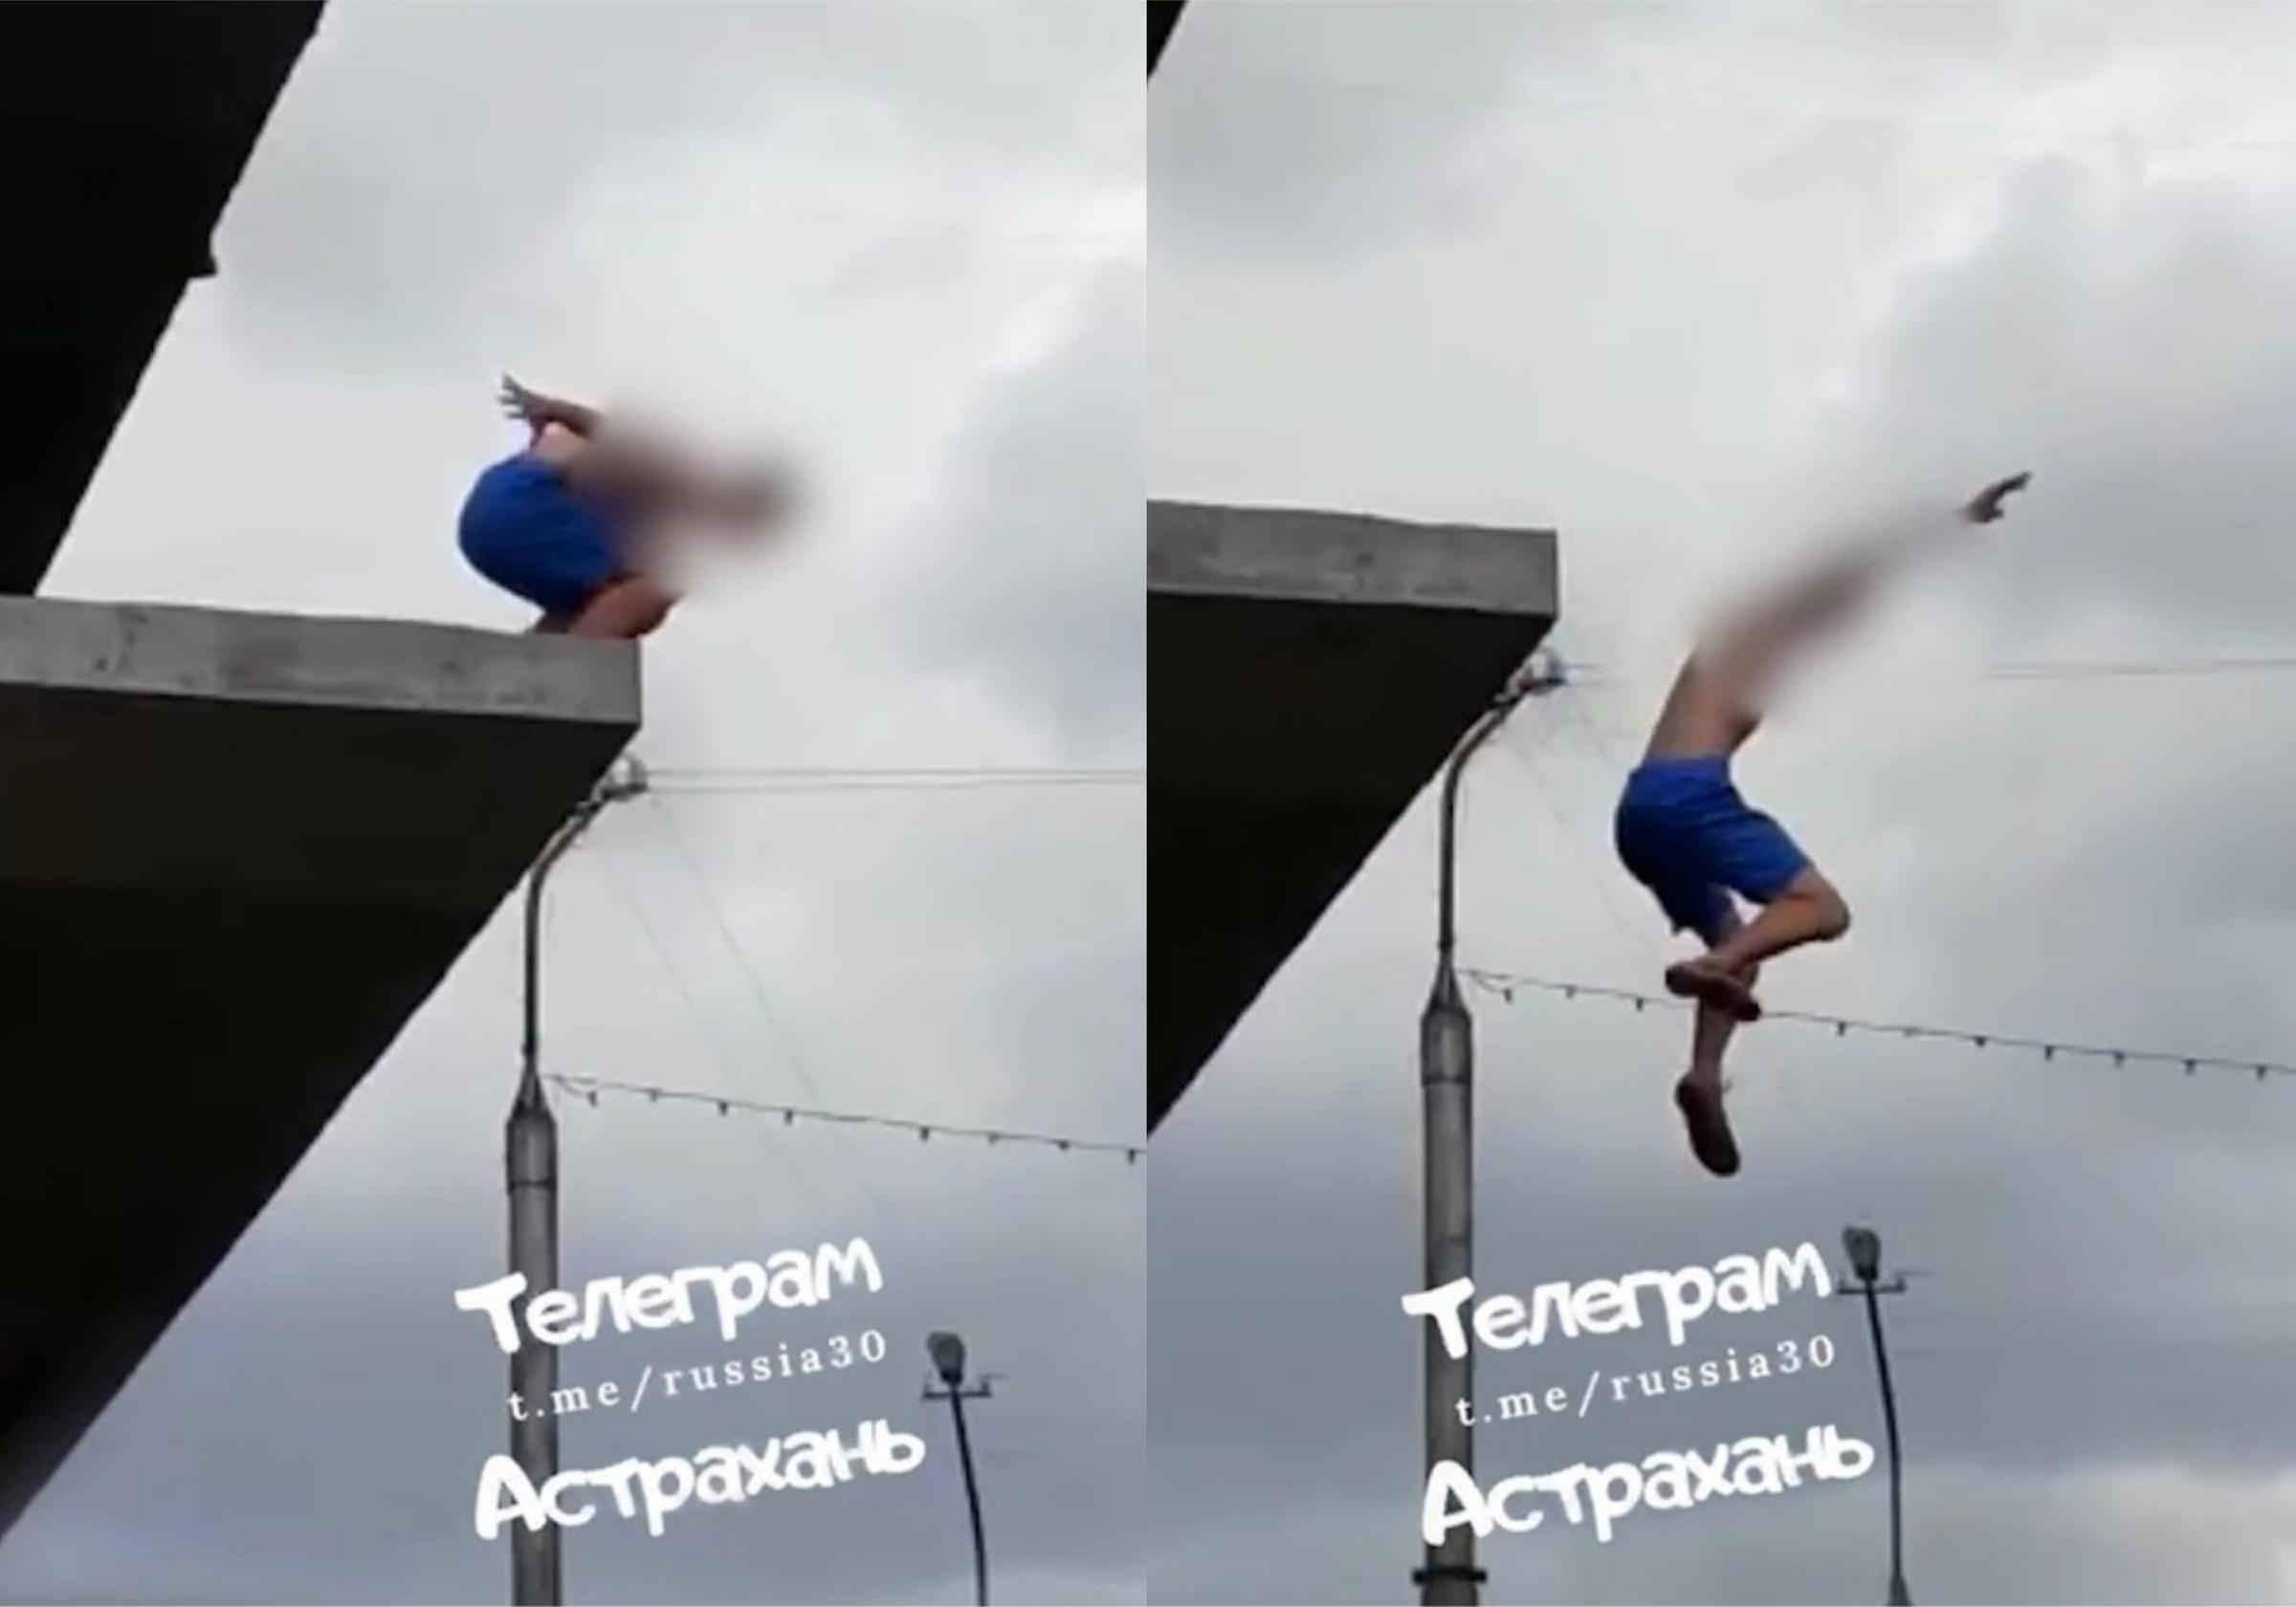 Фото © Telegram / Астрахань в Telegram